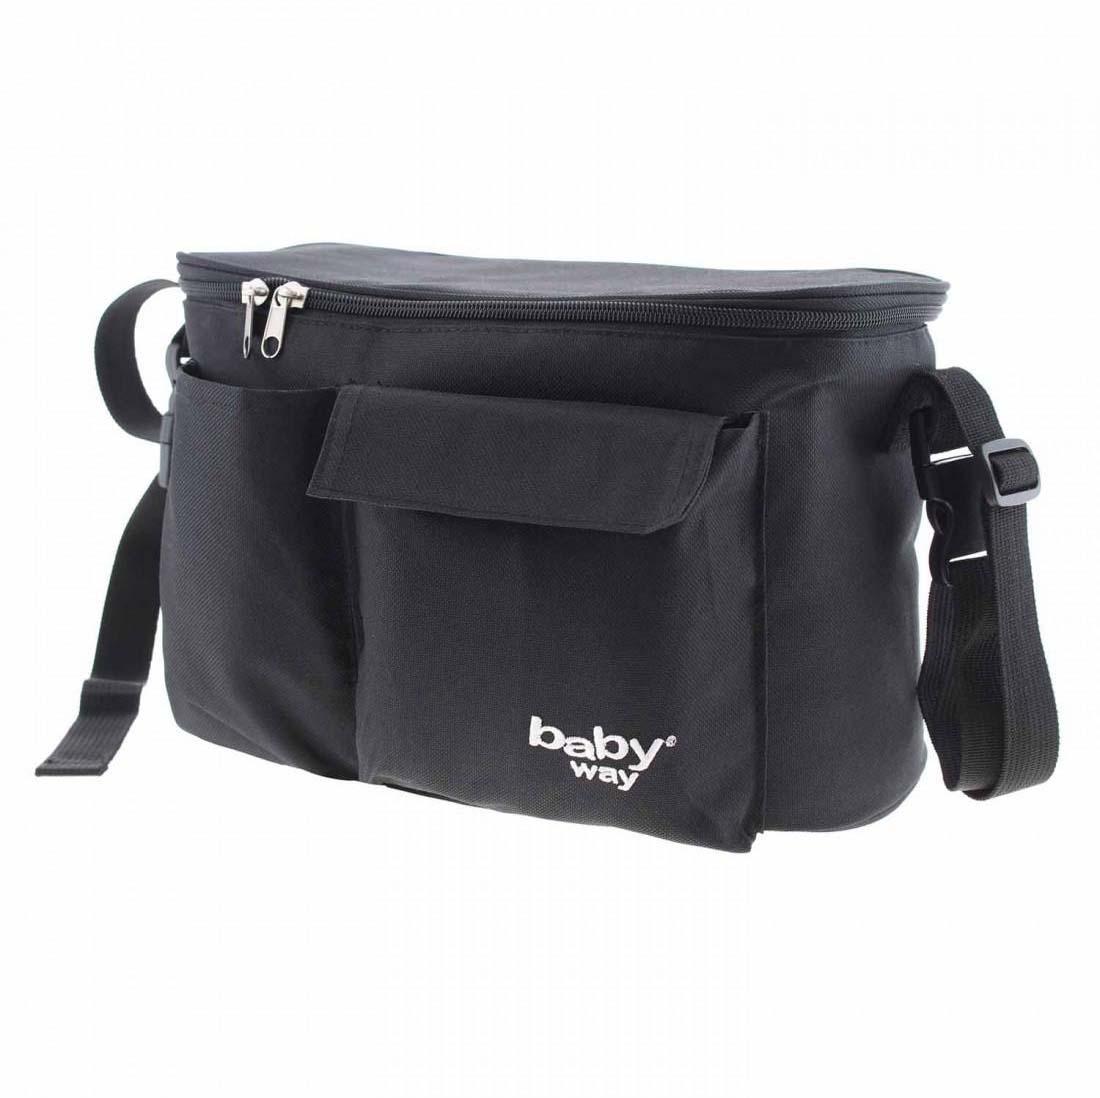 Bolso Maternal Coche Baby Way Bw-Bag25 Negro